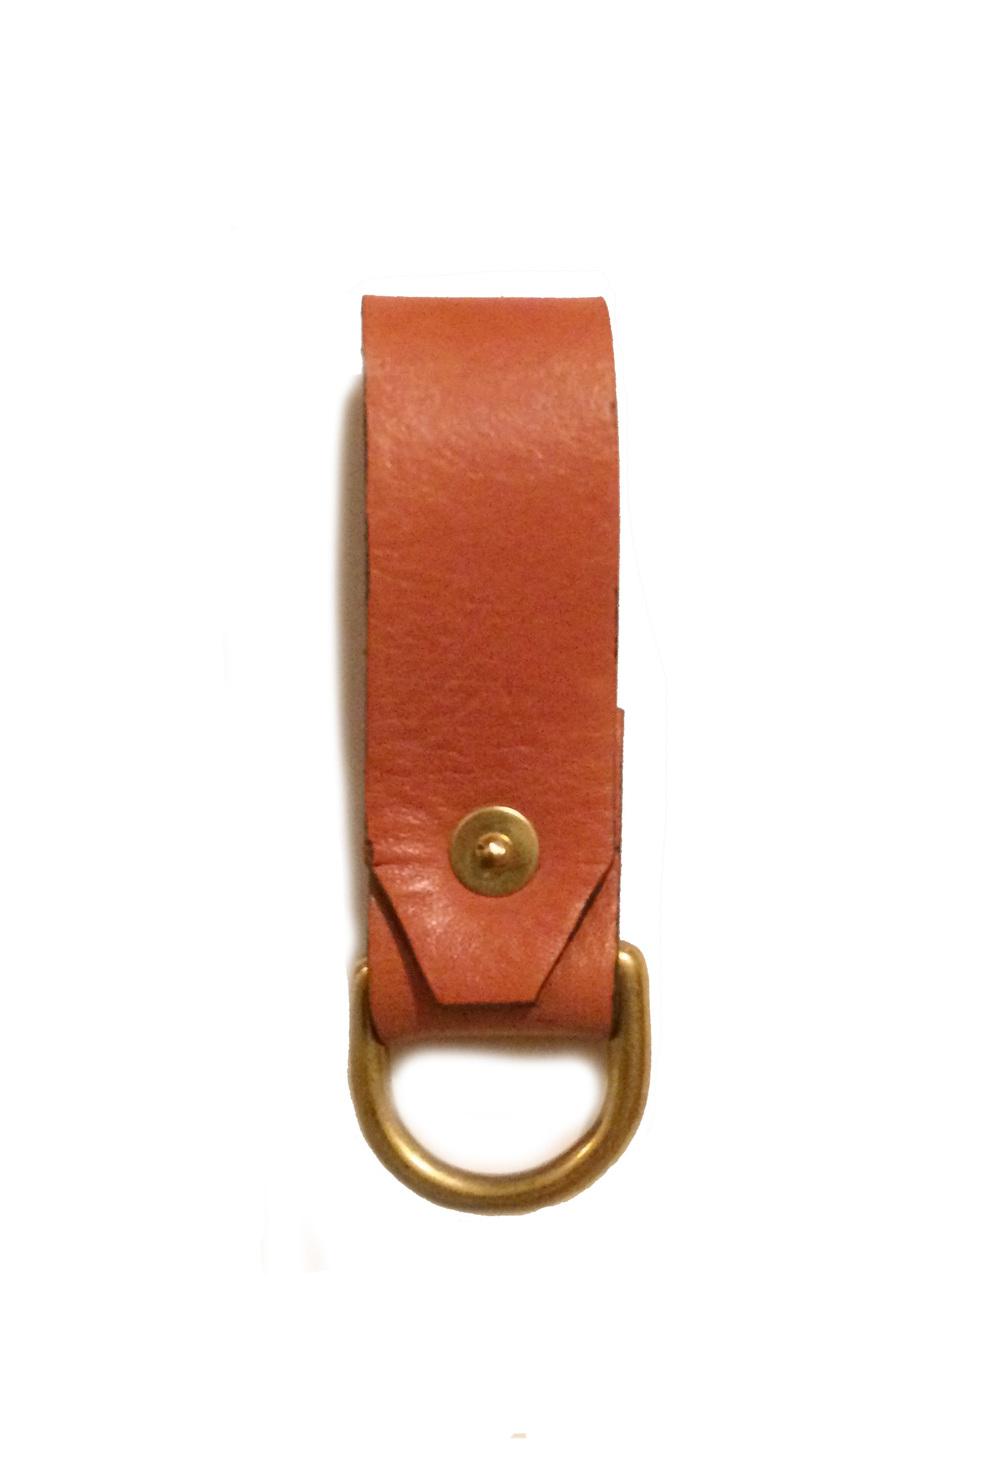 Leather Keyring, Haiti Design Co-op, $18.00